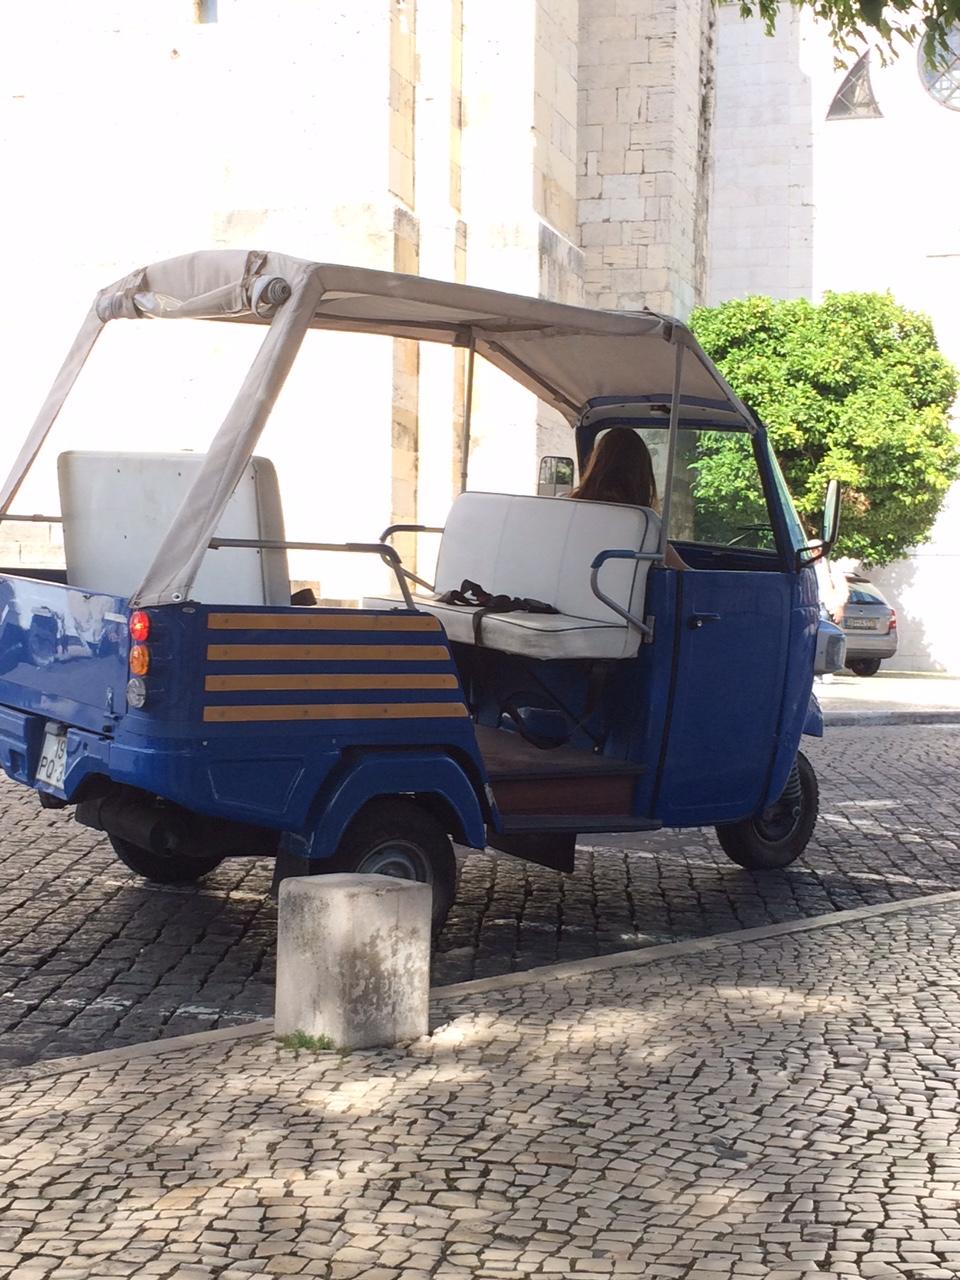 Lisbonne_juin_2016_sironimo_tuktuk_01